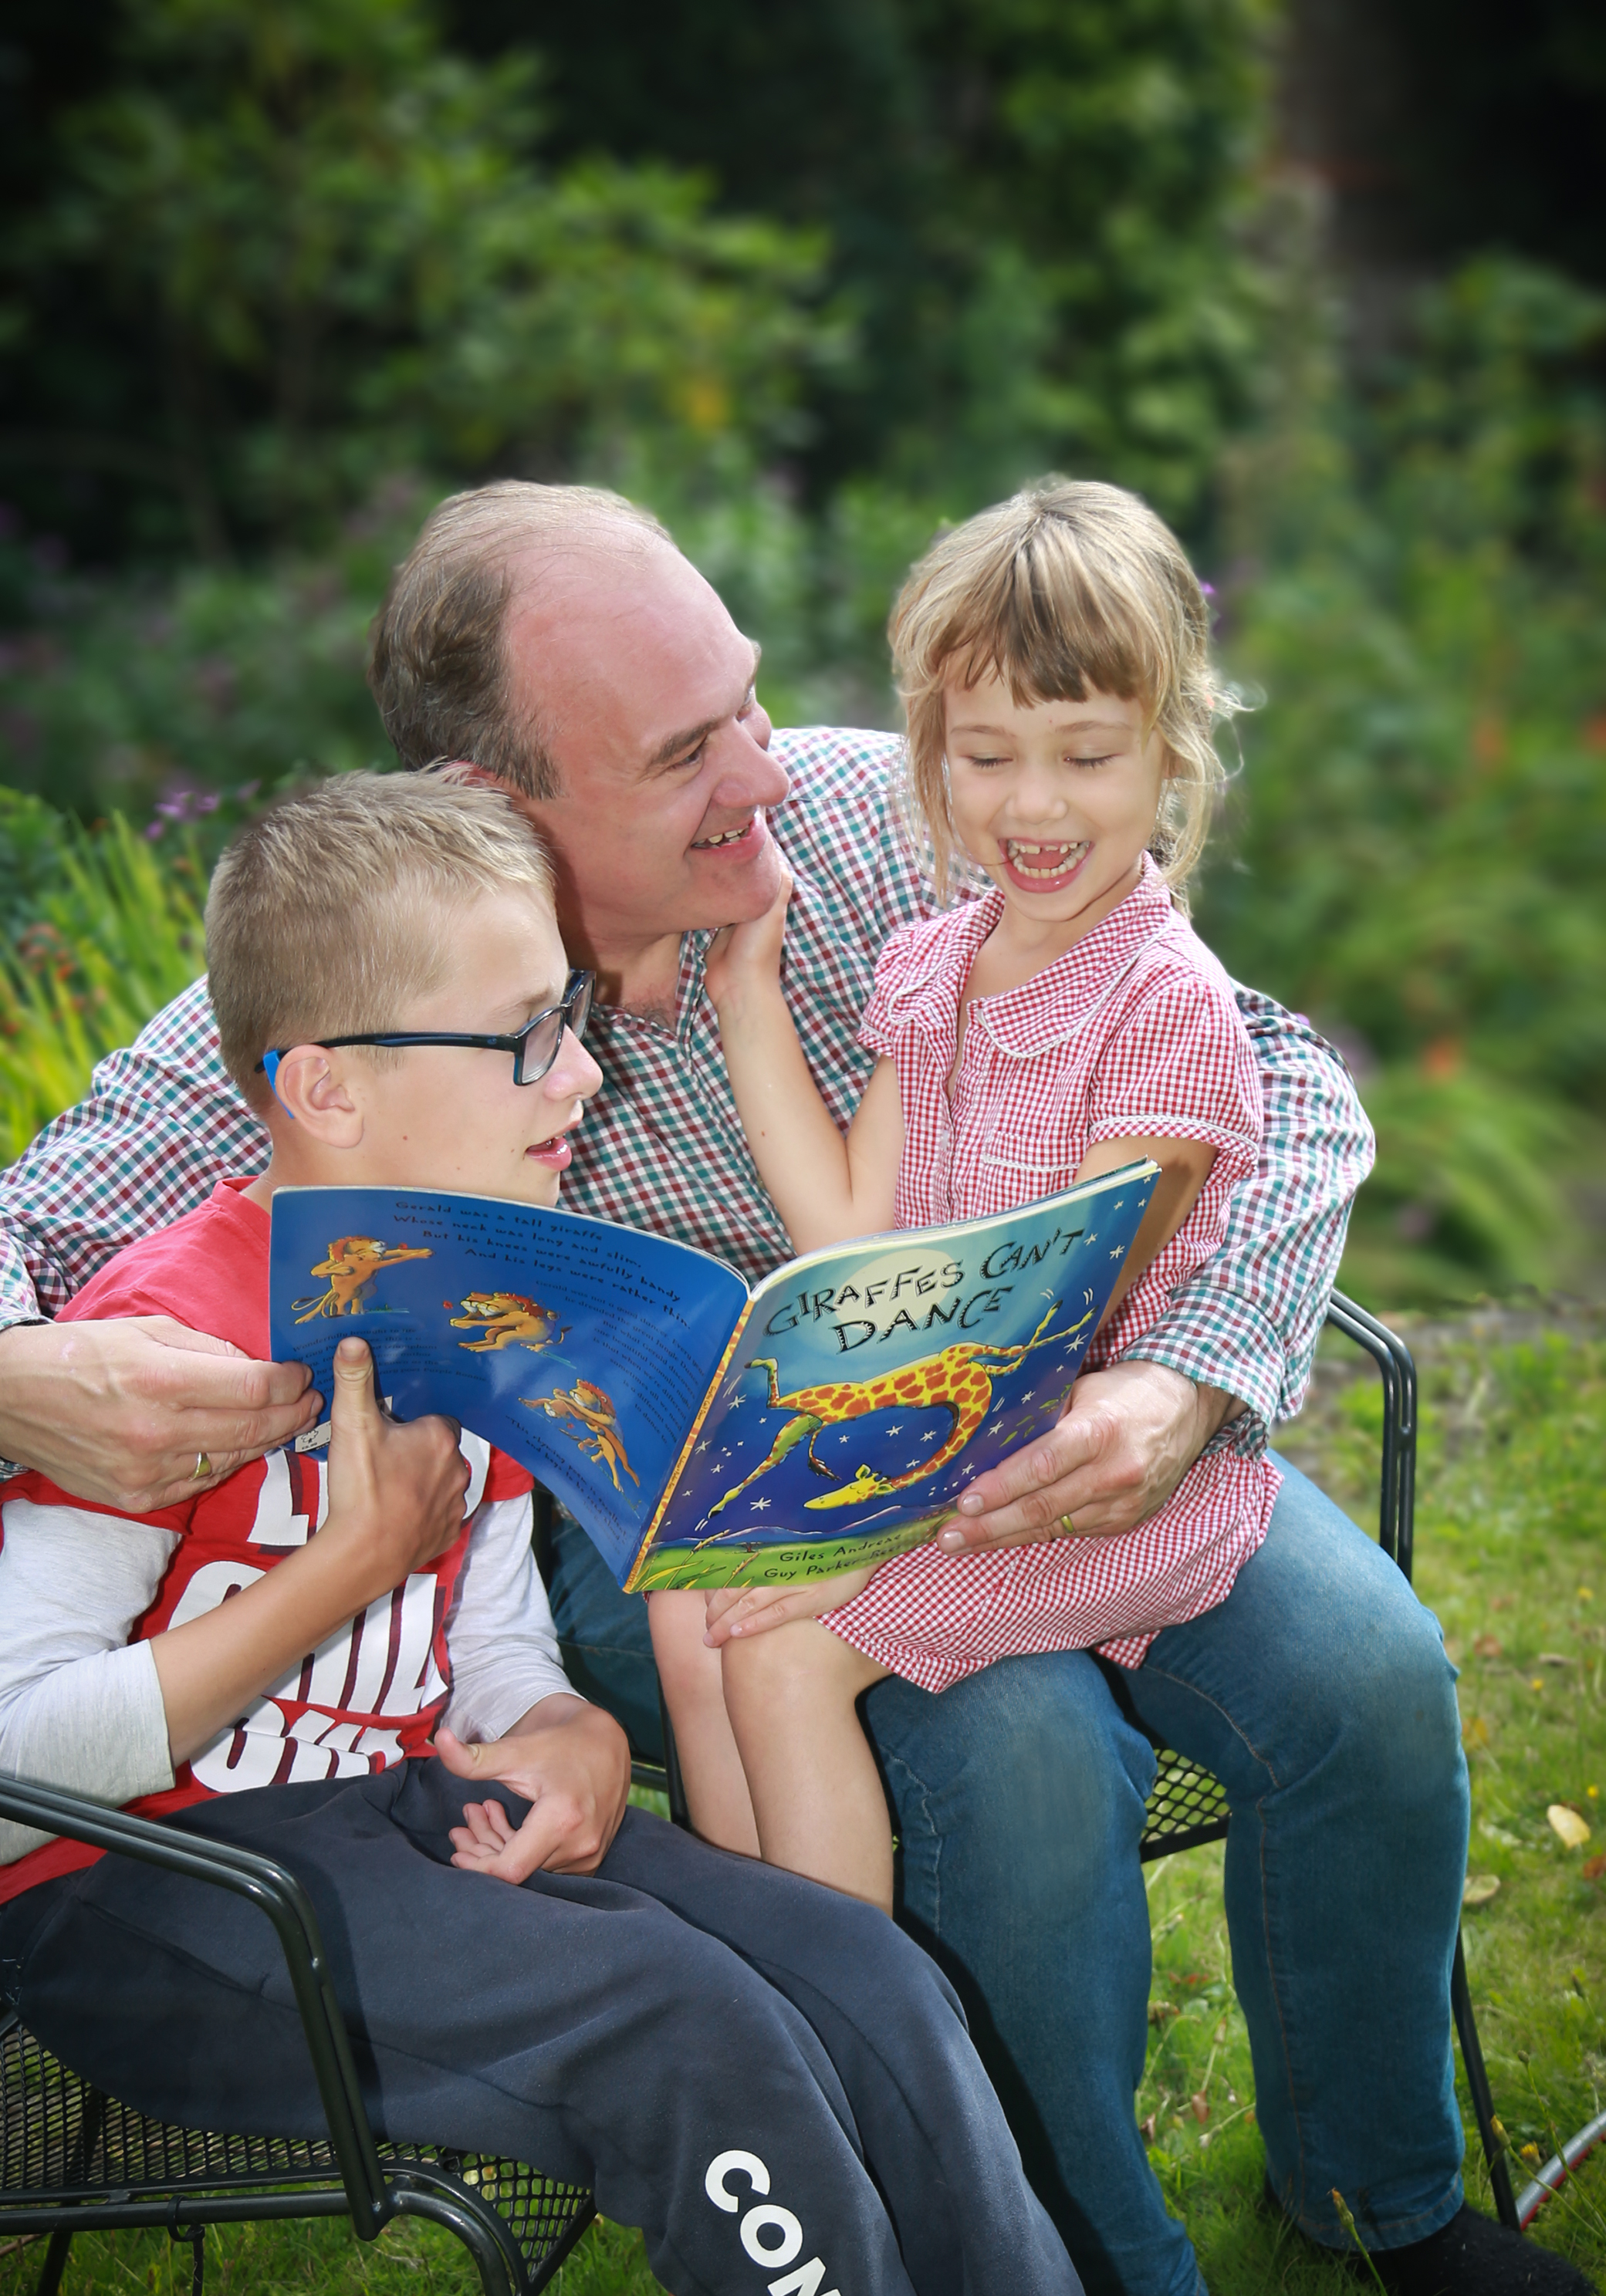 Ed_reading_to_children_in_the_garden.jpg